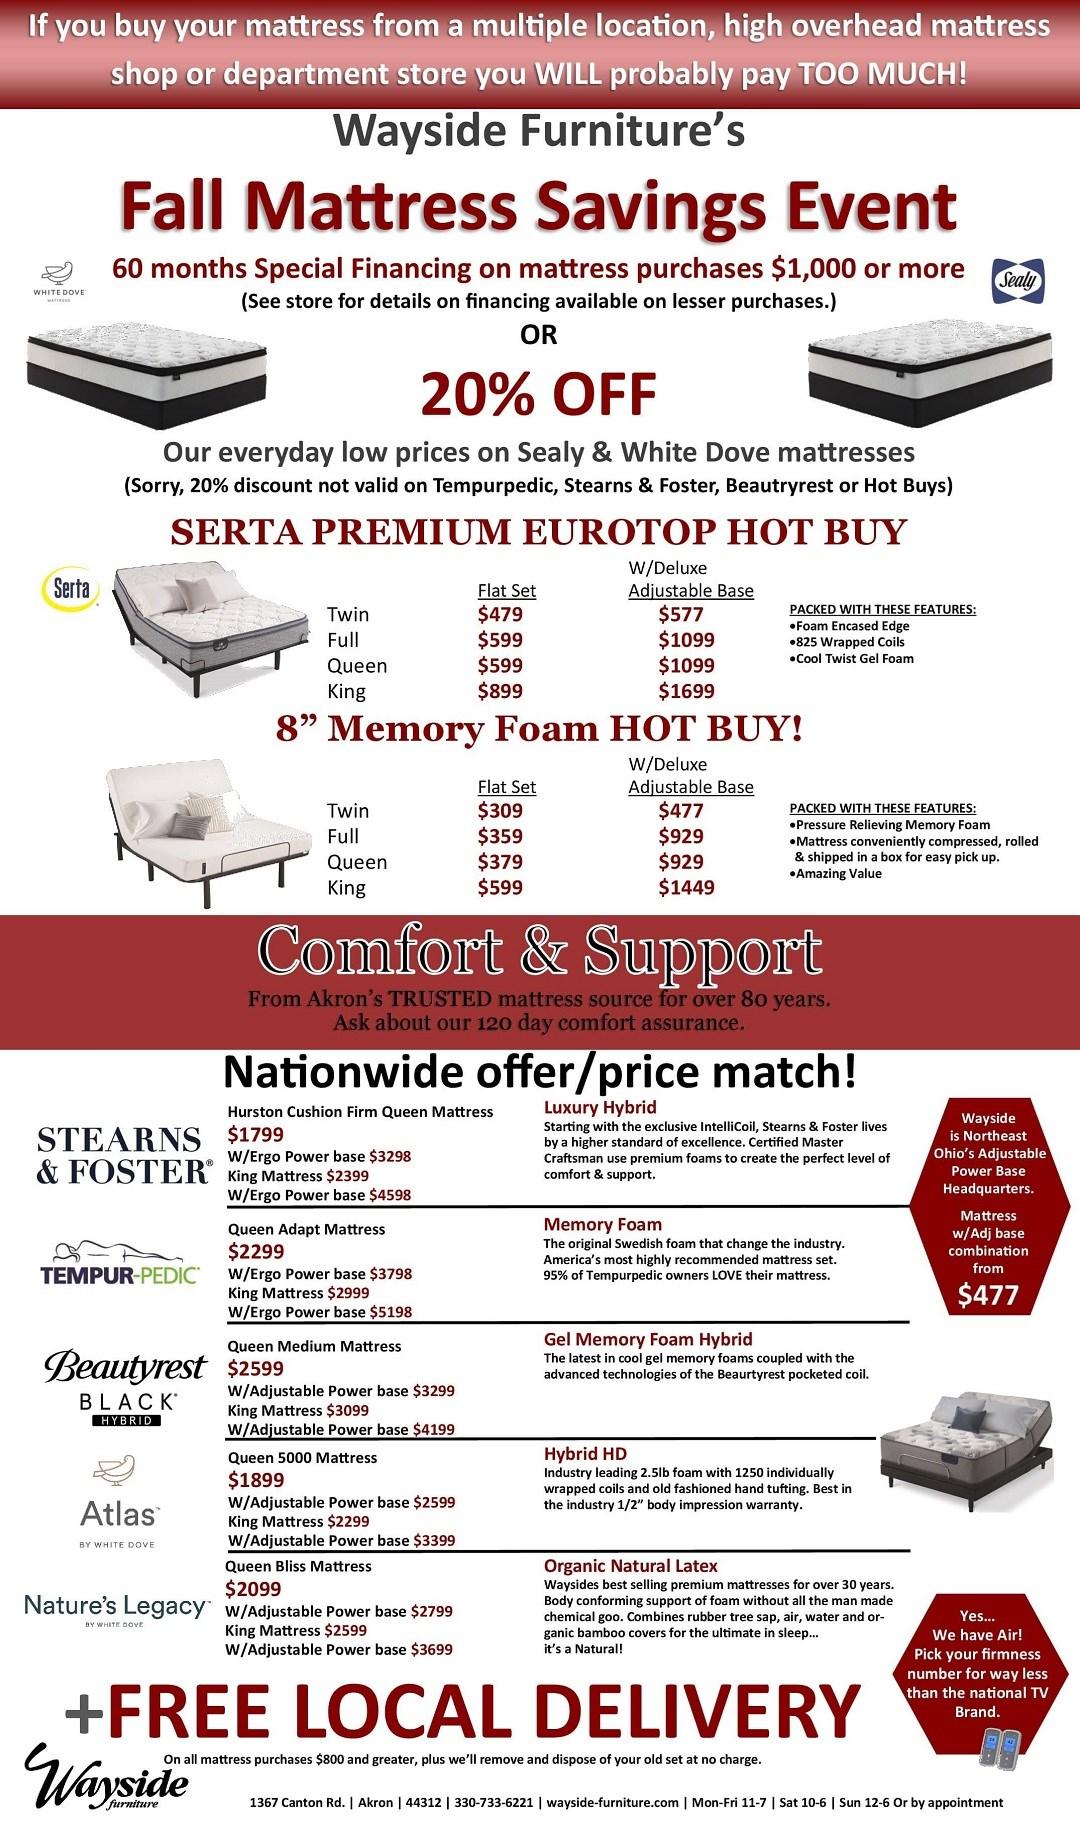 Wayside Furniture's Fall mattress savings event